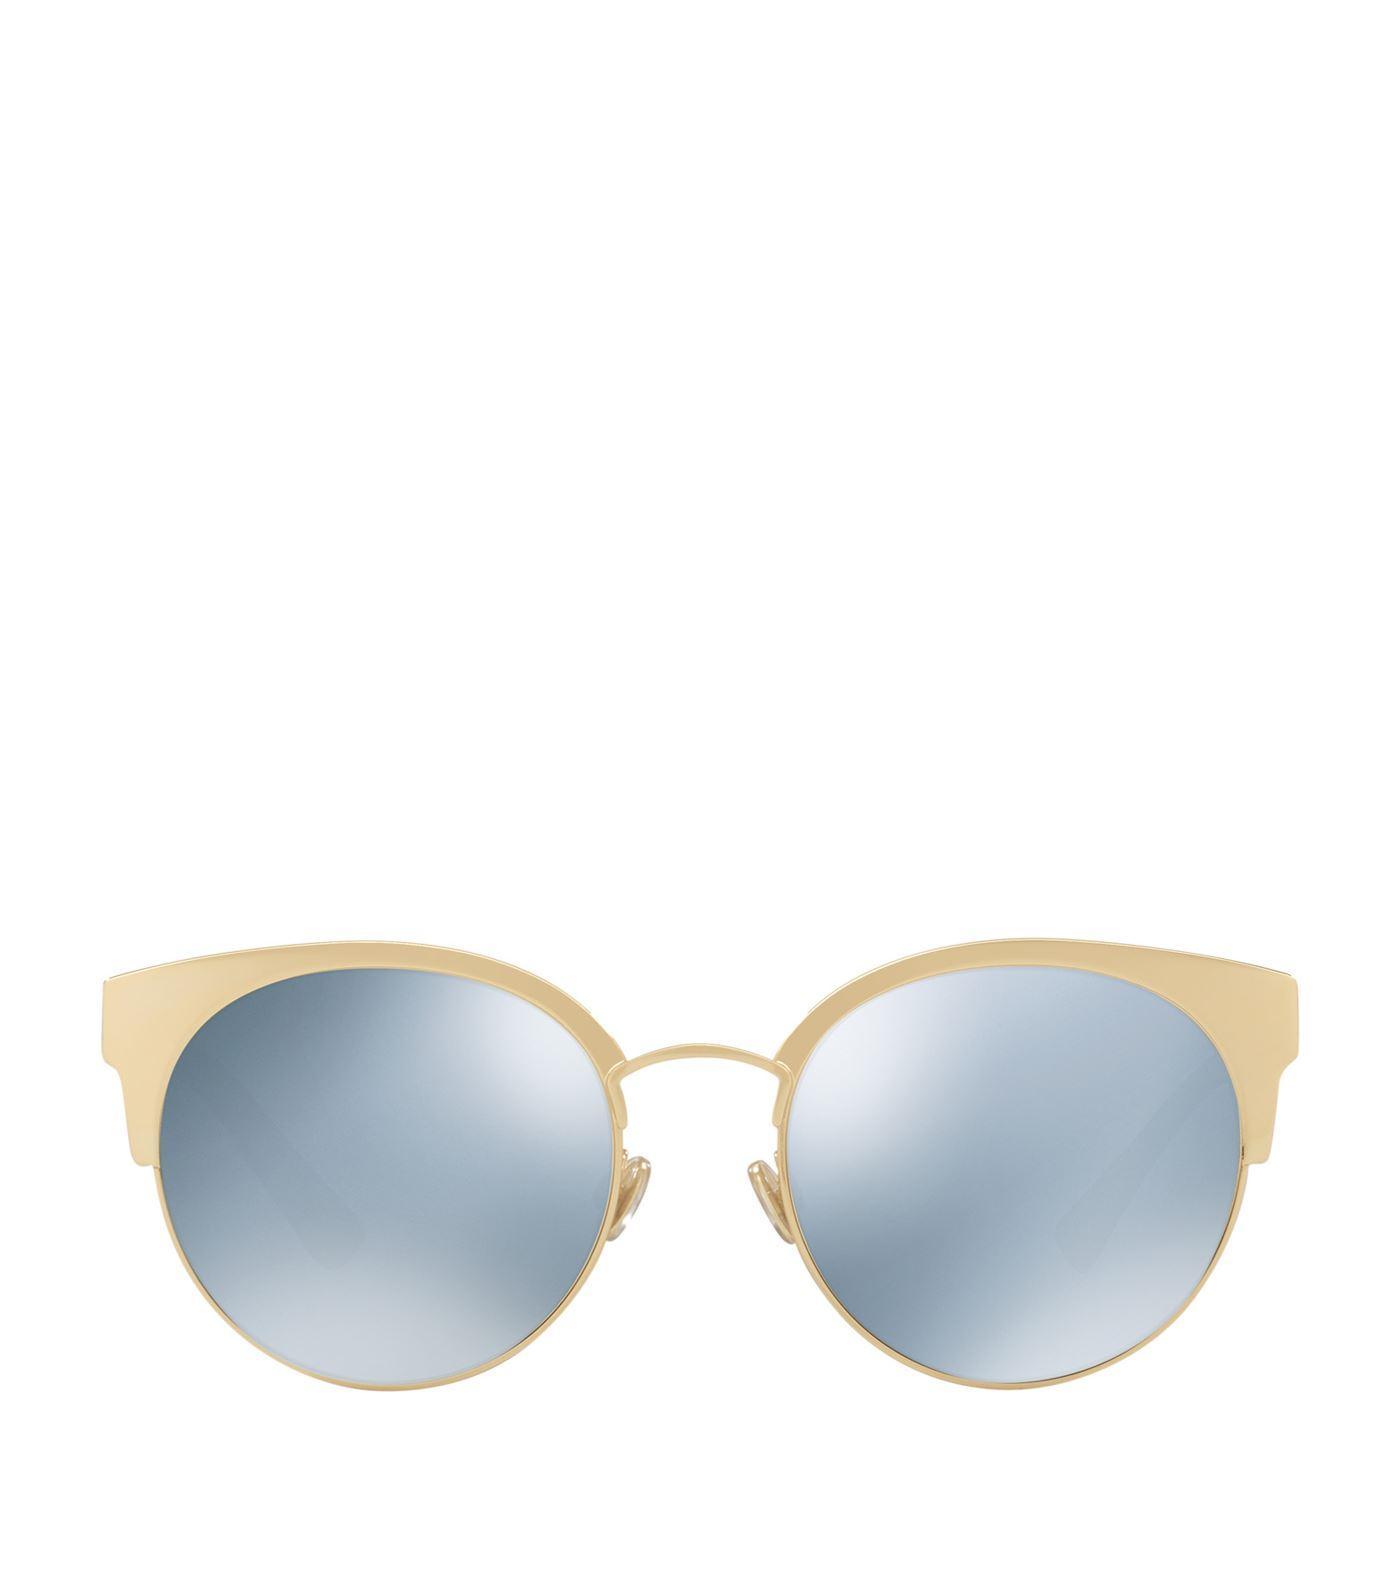 265a22ba76b7 Dior Ama Mirrored Mini Cat Eye Sunglasses